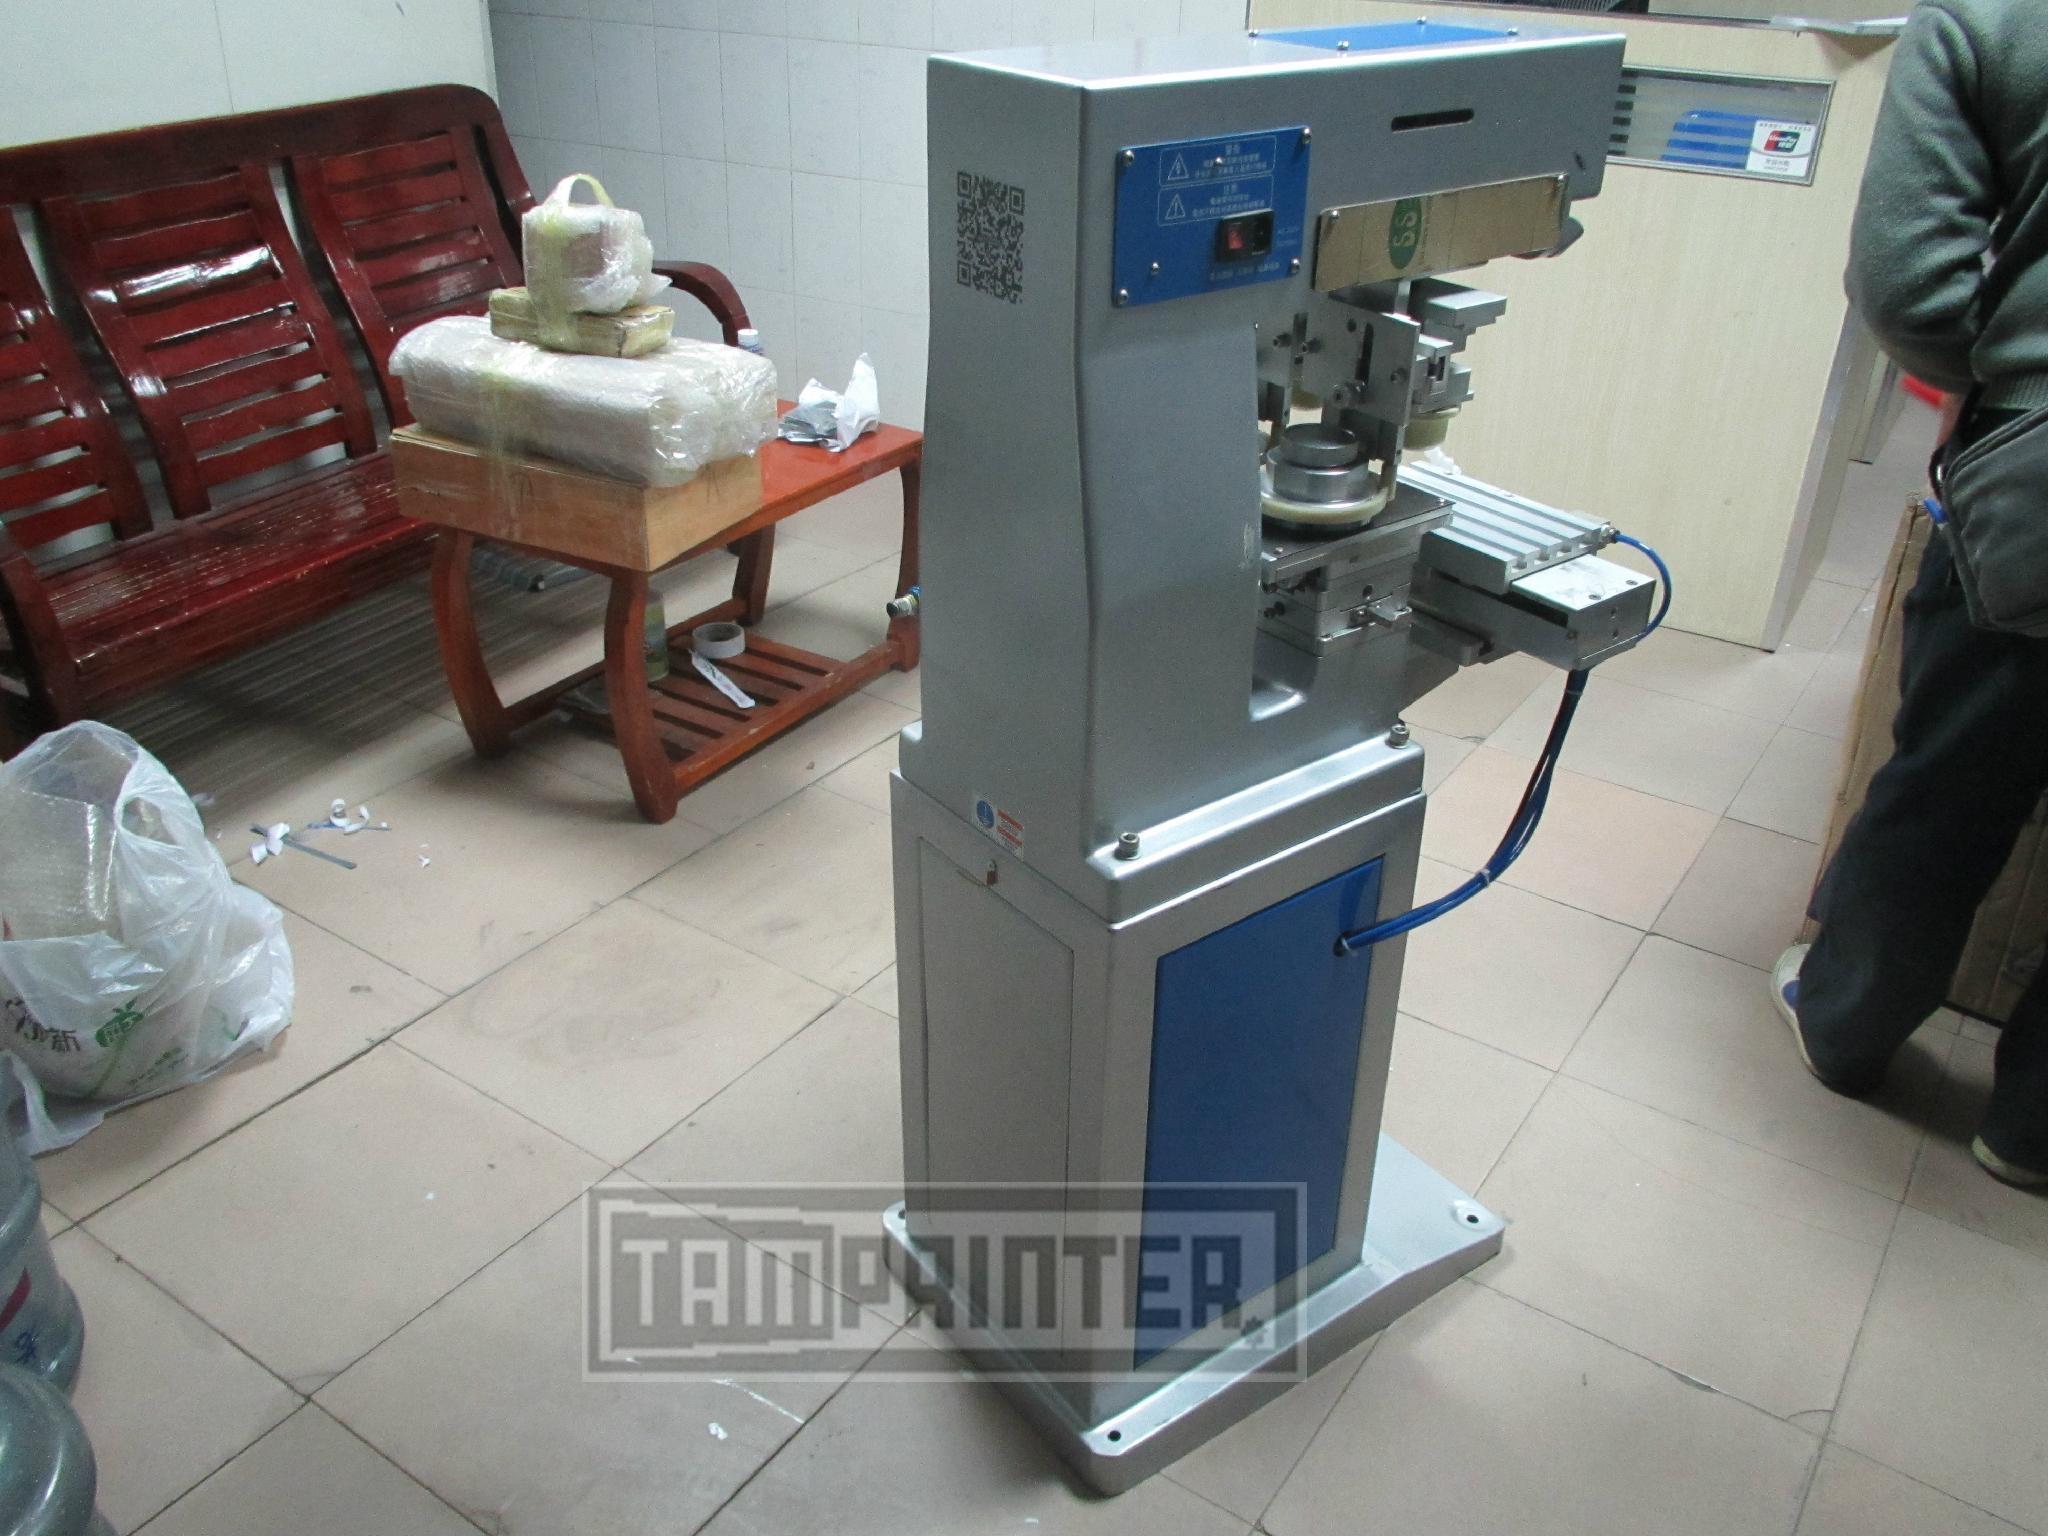 PP pad printing machines